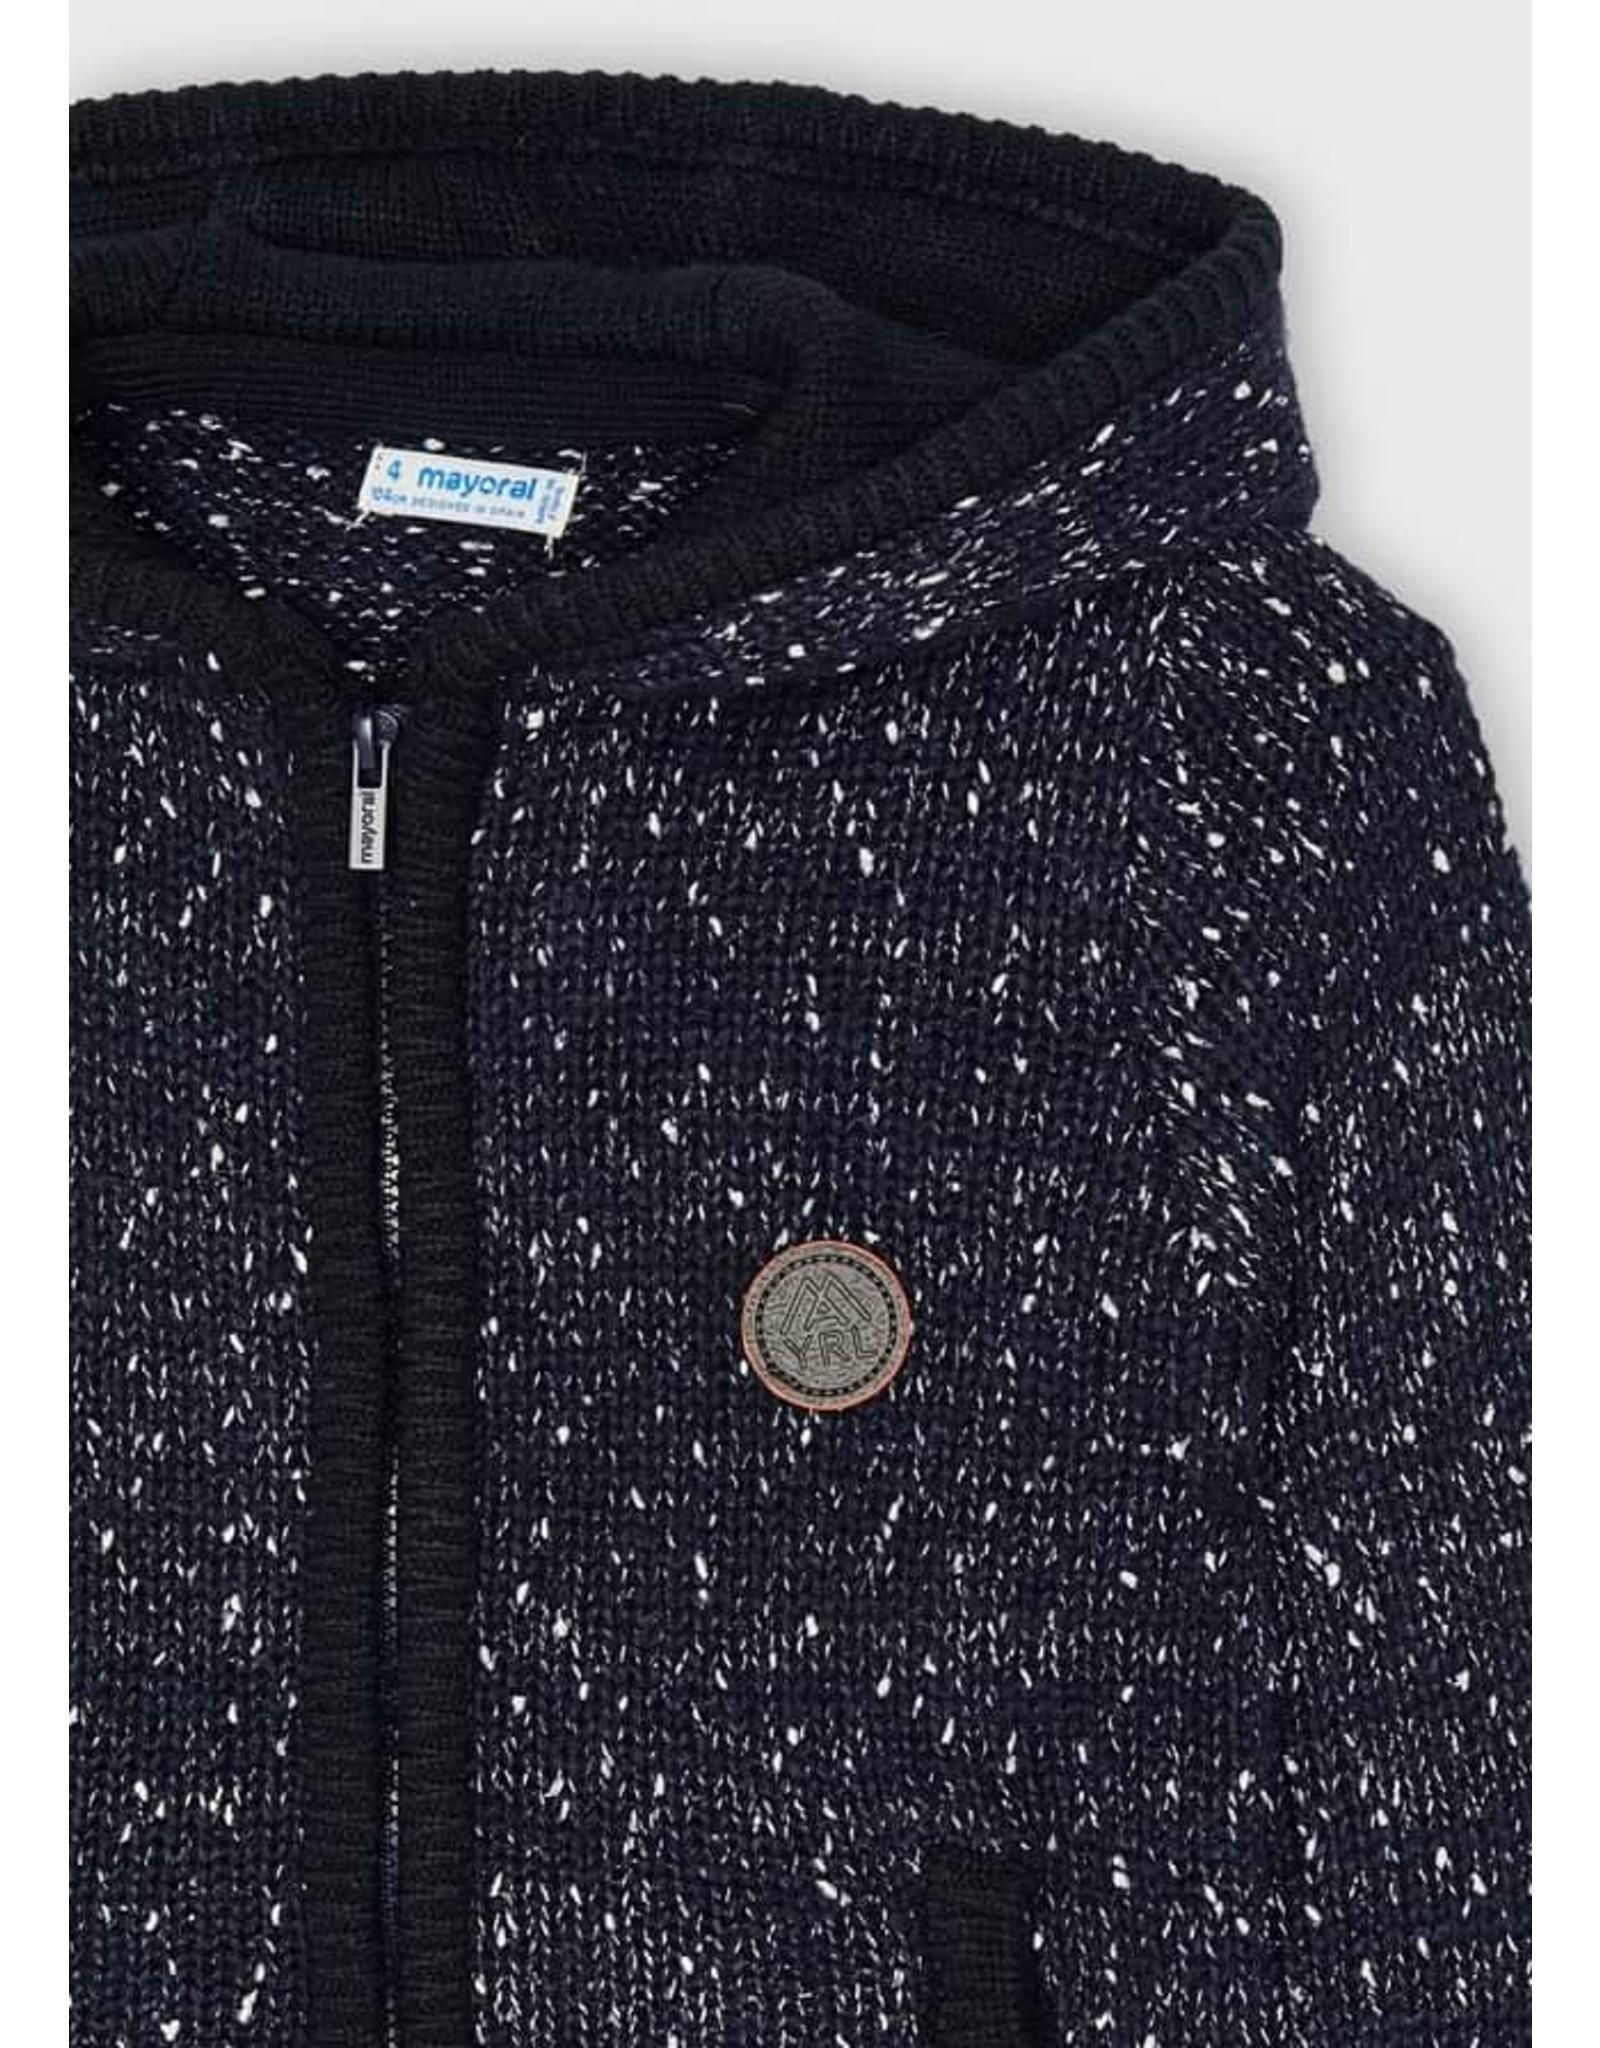 Mayoral Night Knit Sweatshirt